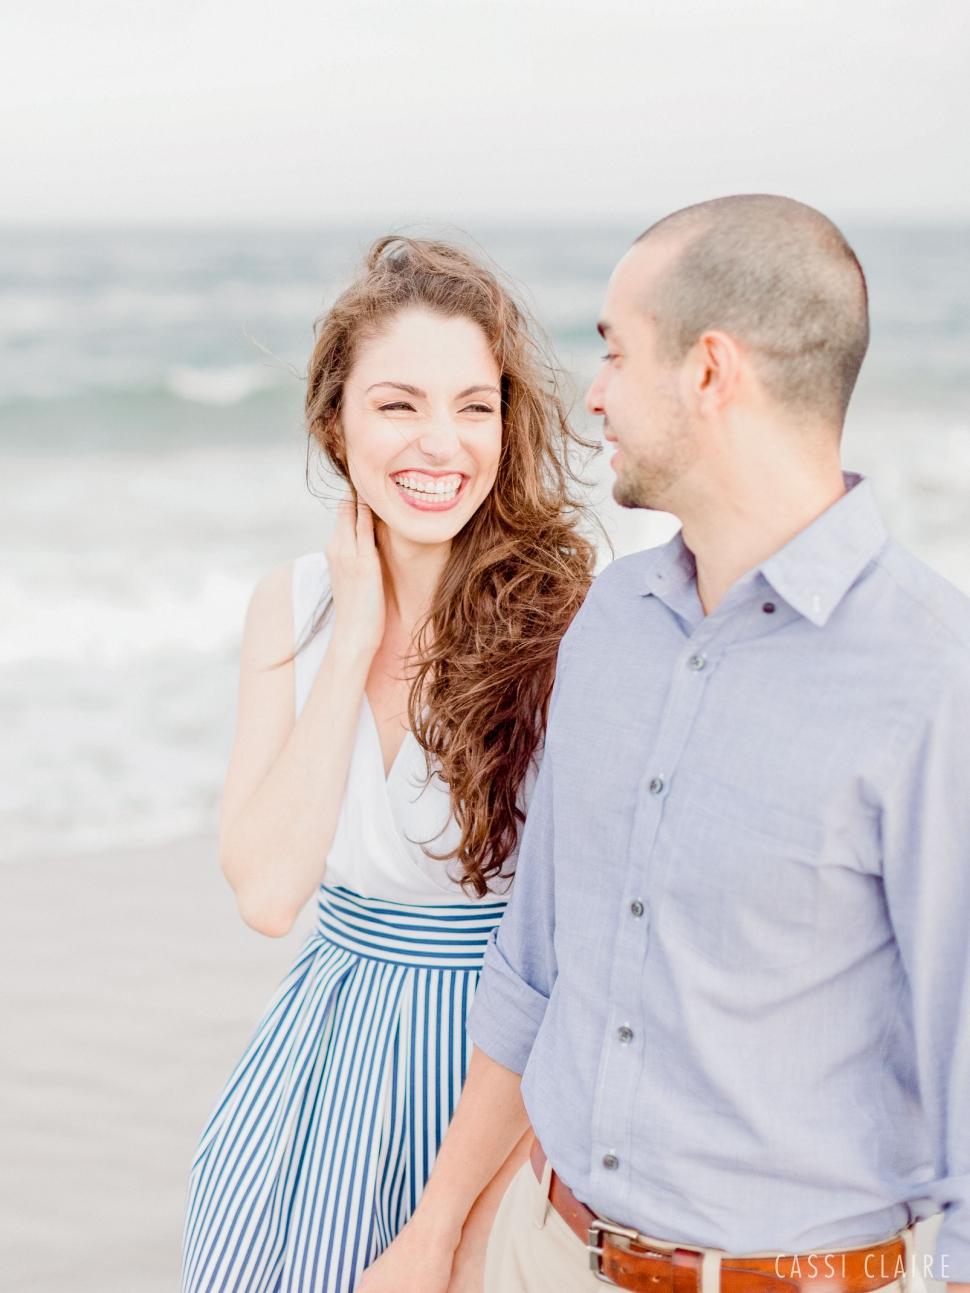 Coney-Island-Engagement-Photos-New-York-Wedding-Photographer_01.jpg